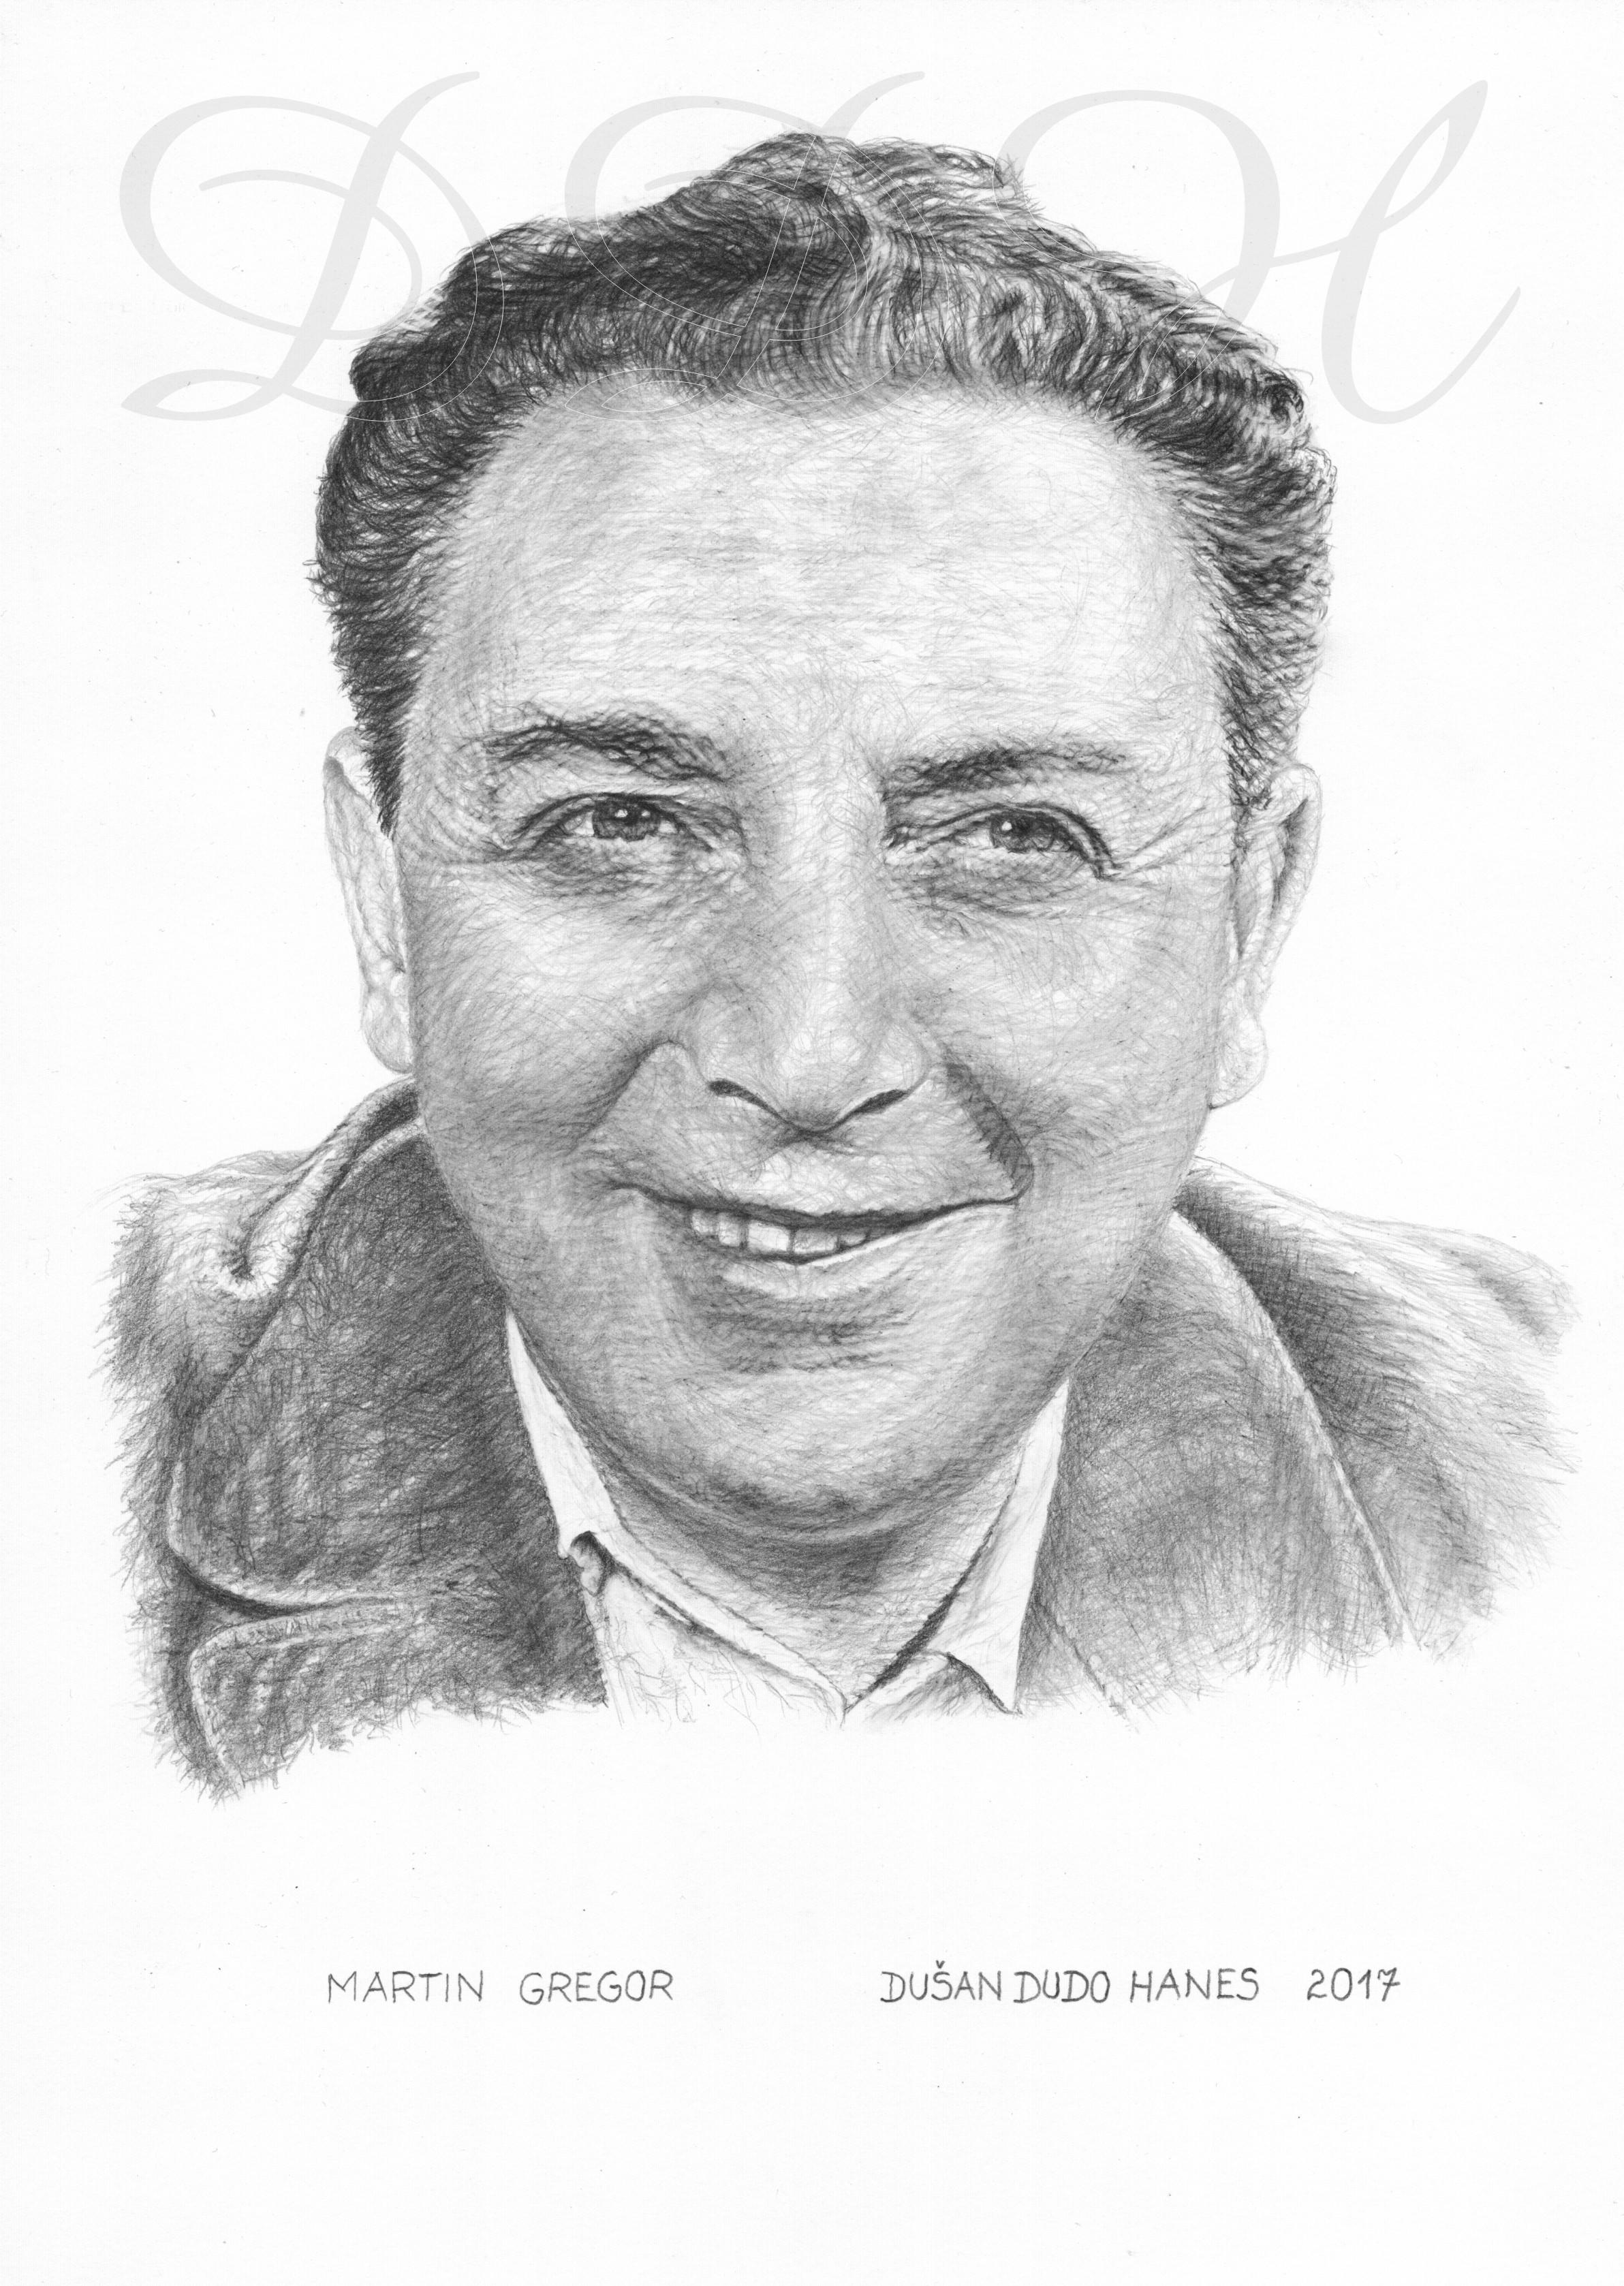 104_Martin Gregor, portrét Dušan Dudo Hanes